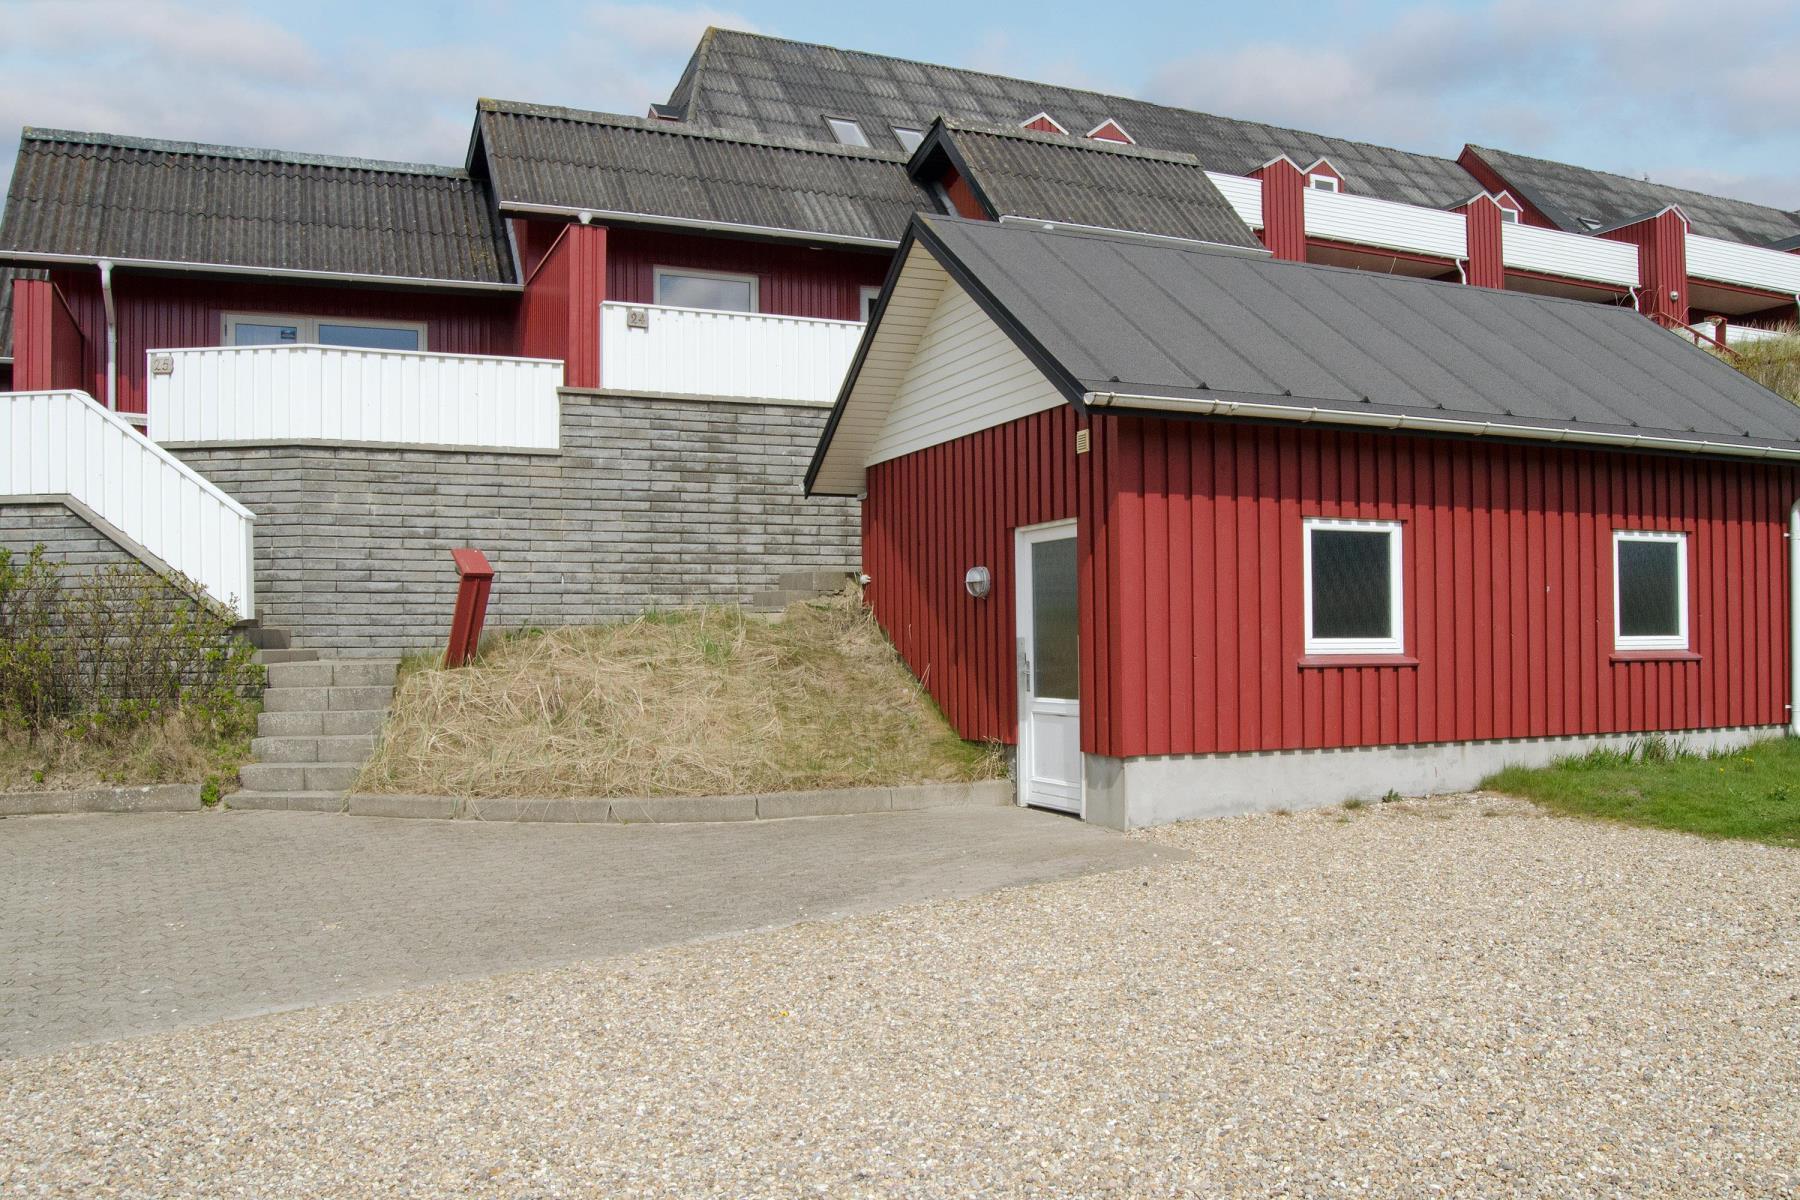 Ferienhaus 1018 - Hjelmevej 15, App. 18